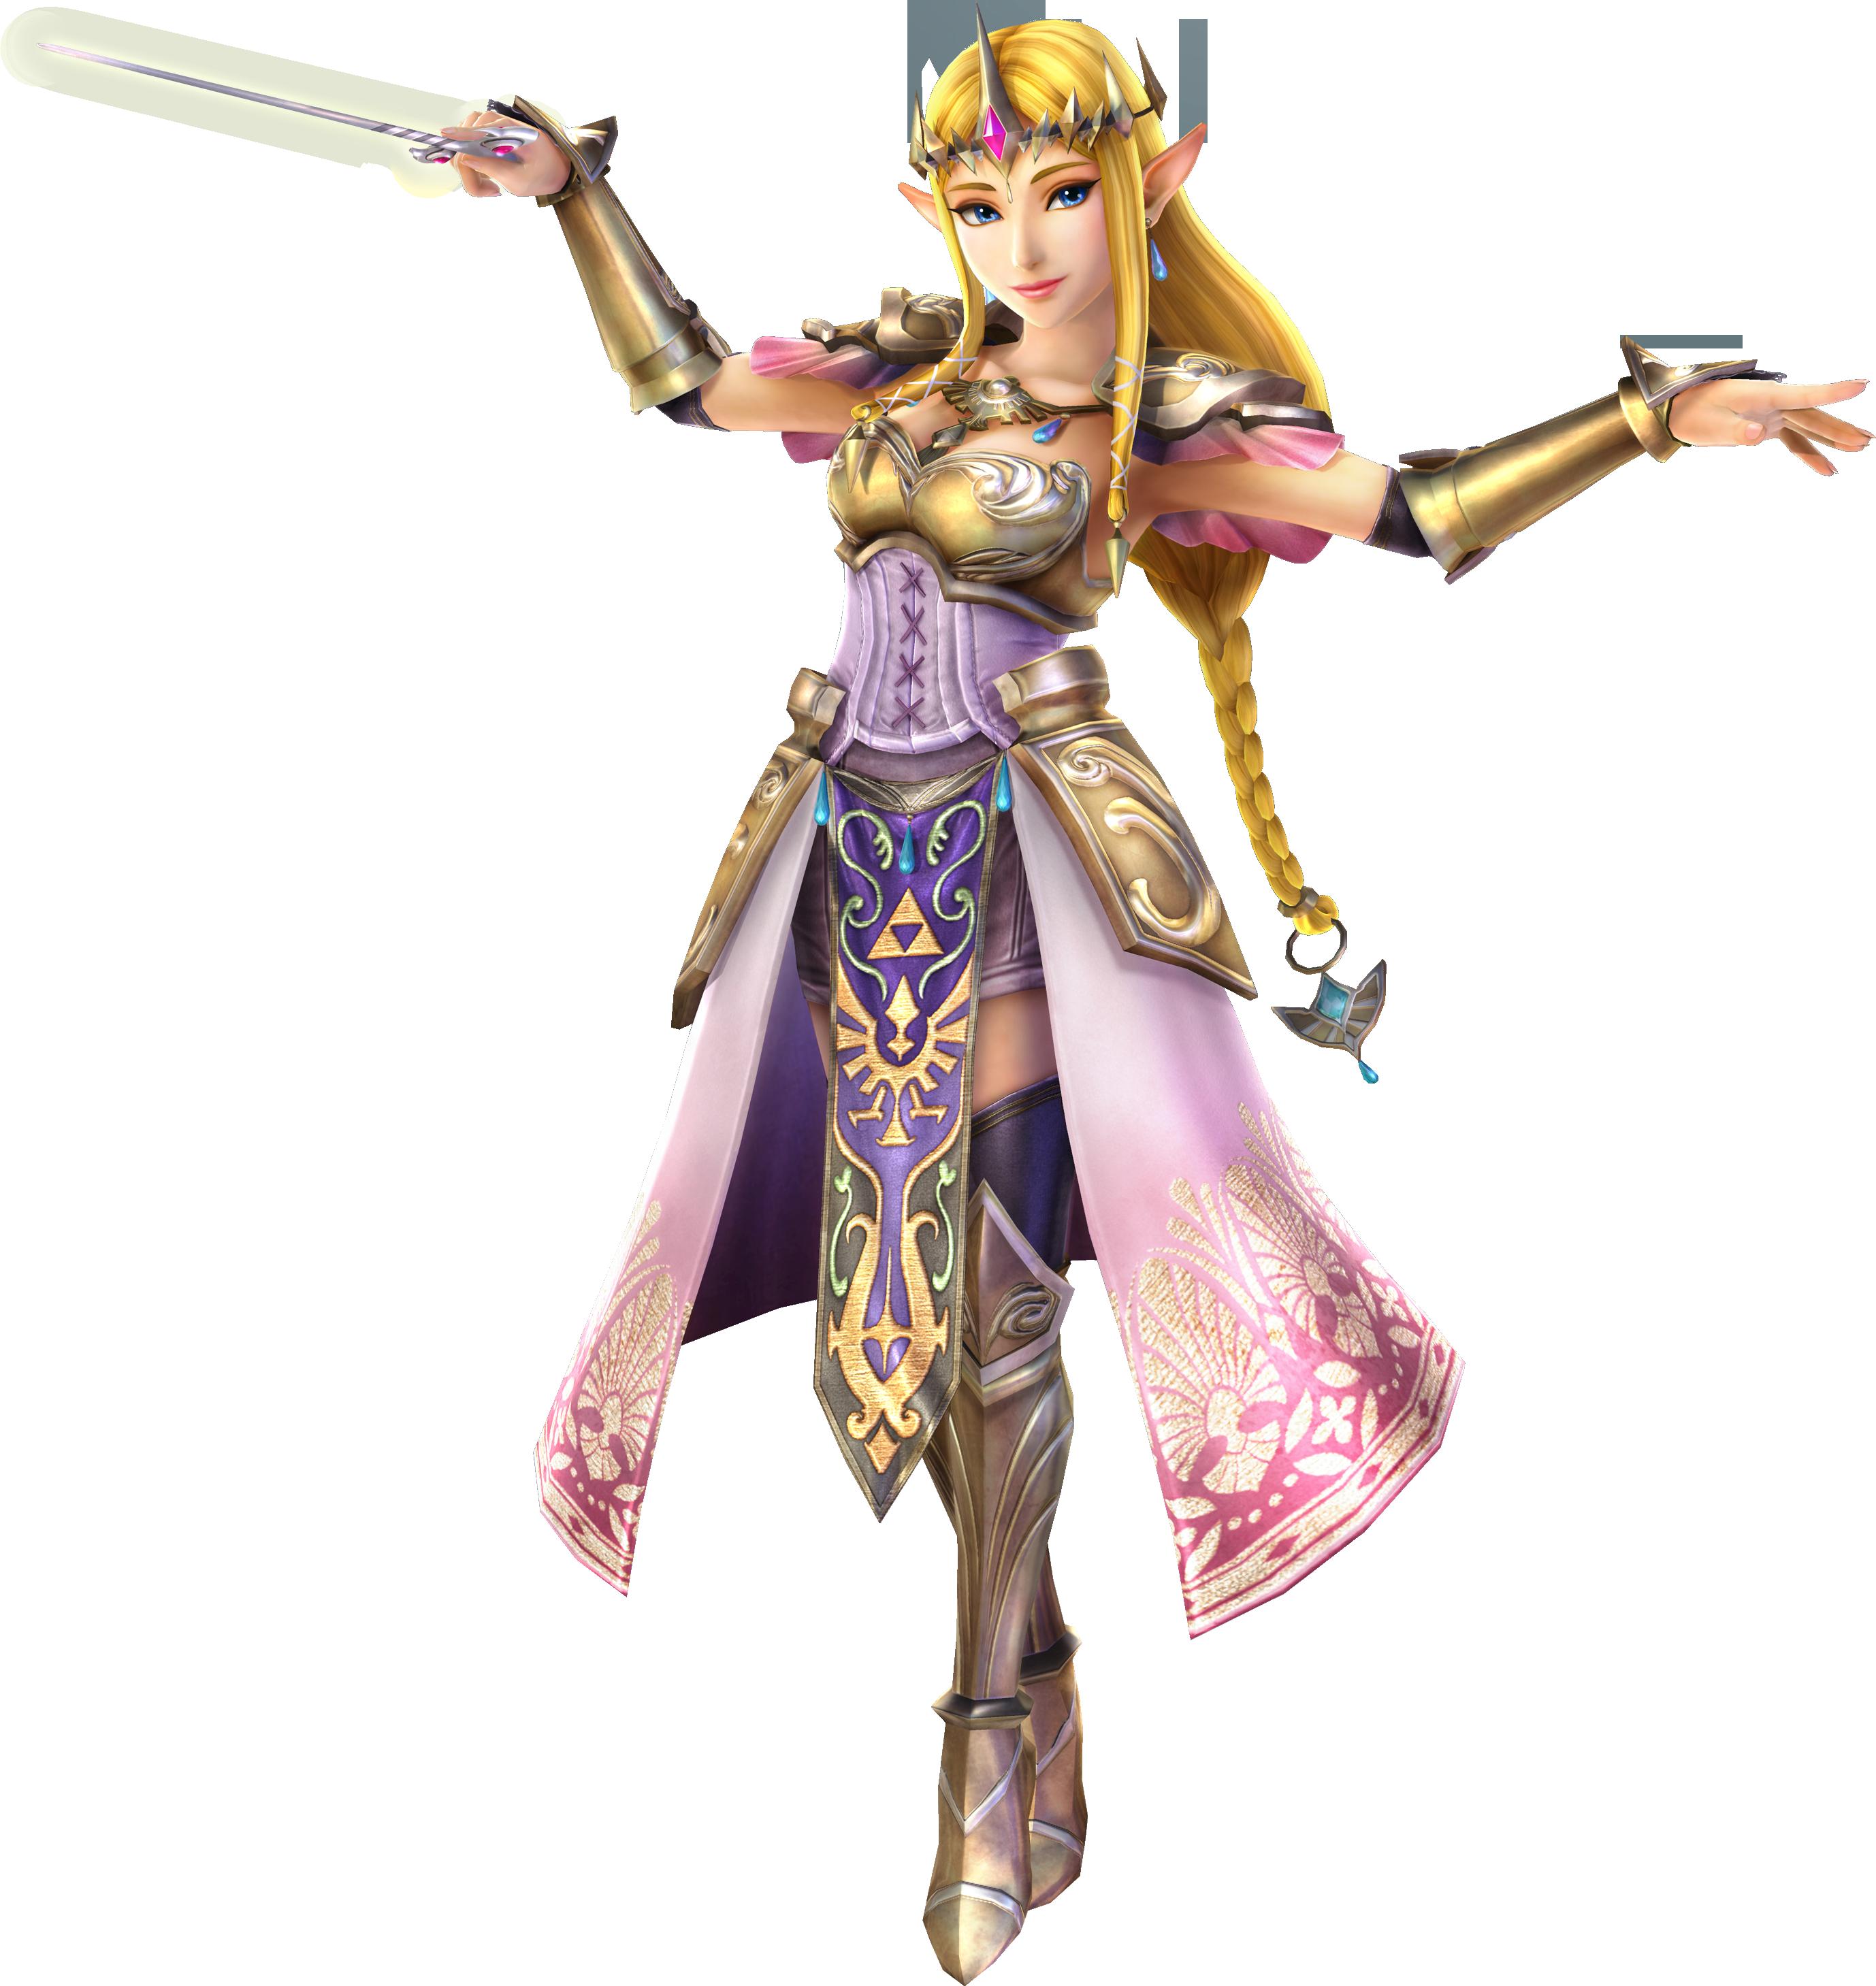 Baton zelda dungeon wiki - La princesse zelda ...